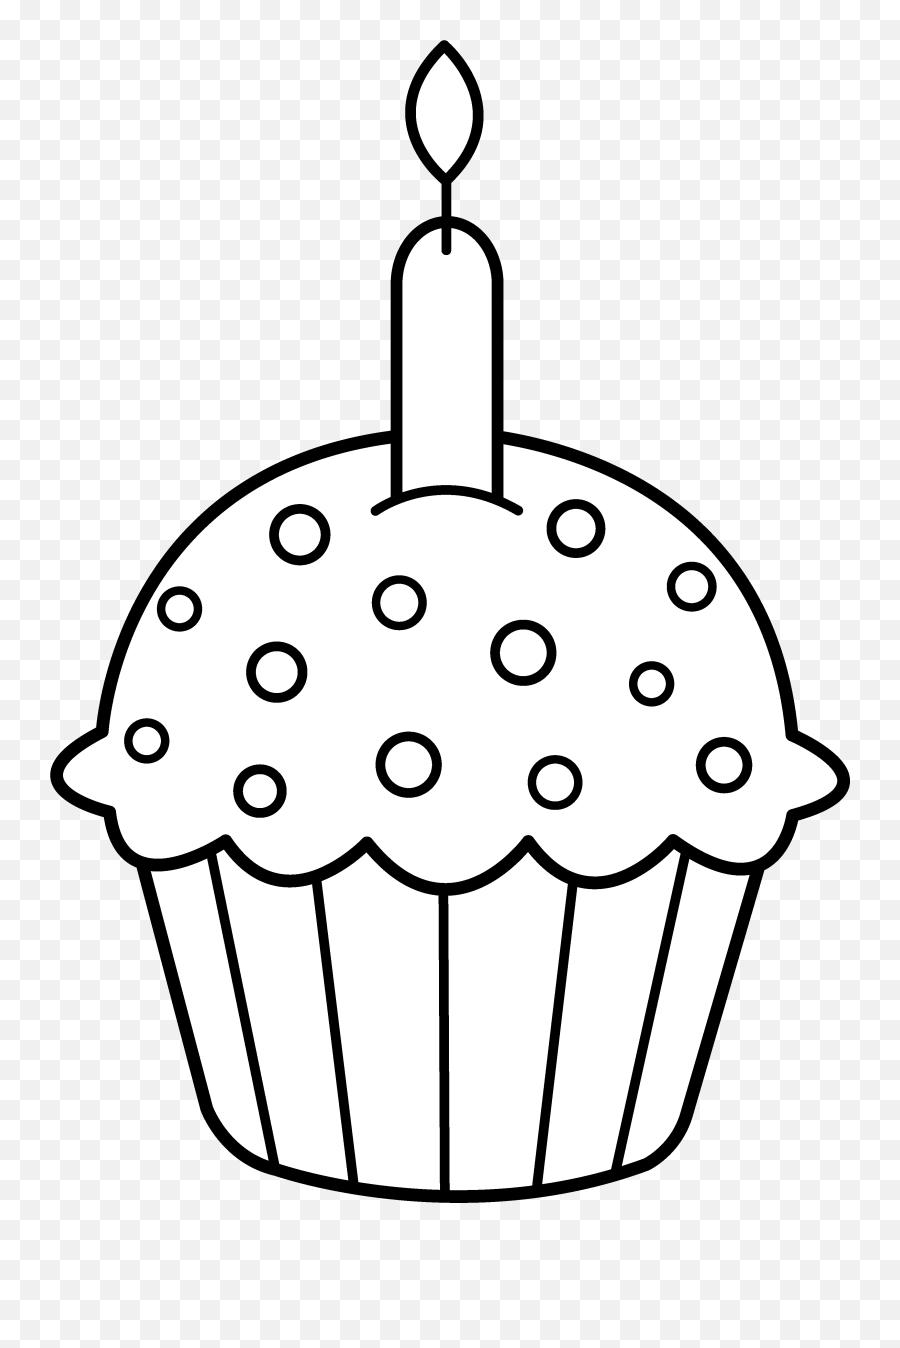 Icolor Roundtop Cupcake - Birthday Cupcake Clipart Black And White Emoji